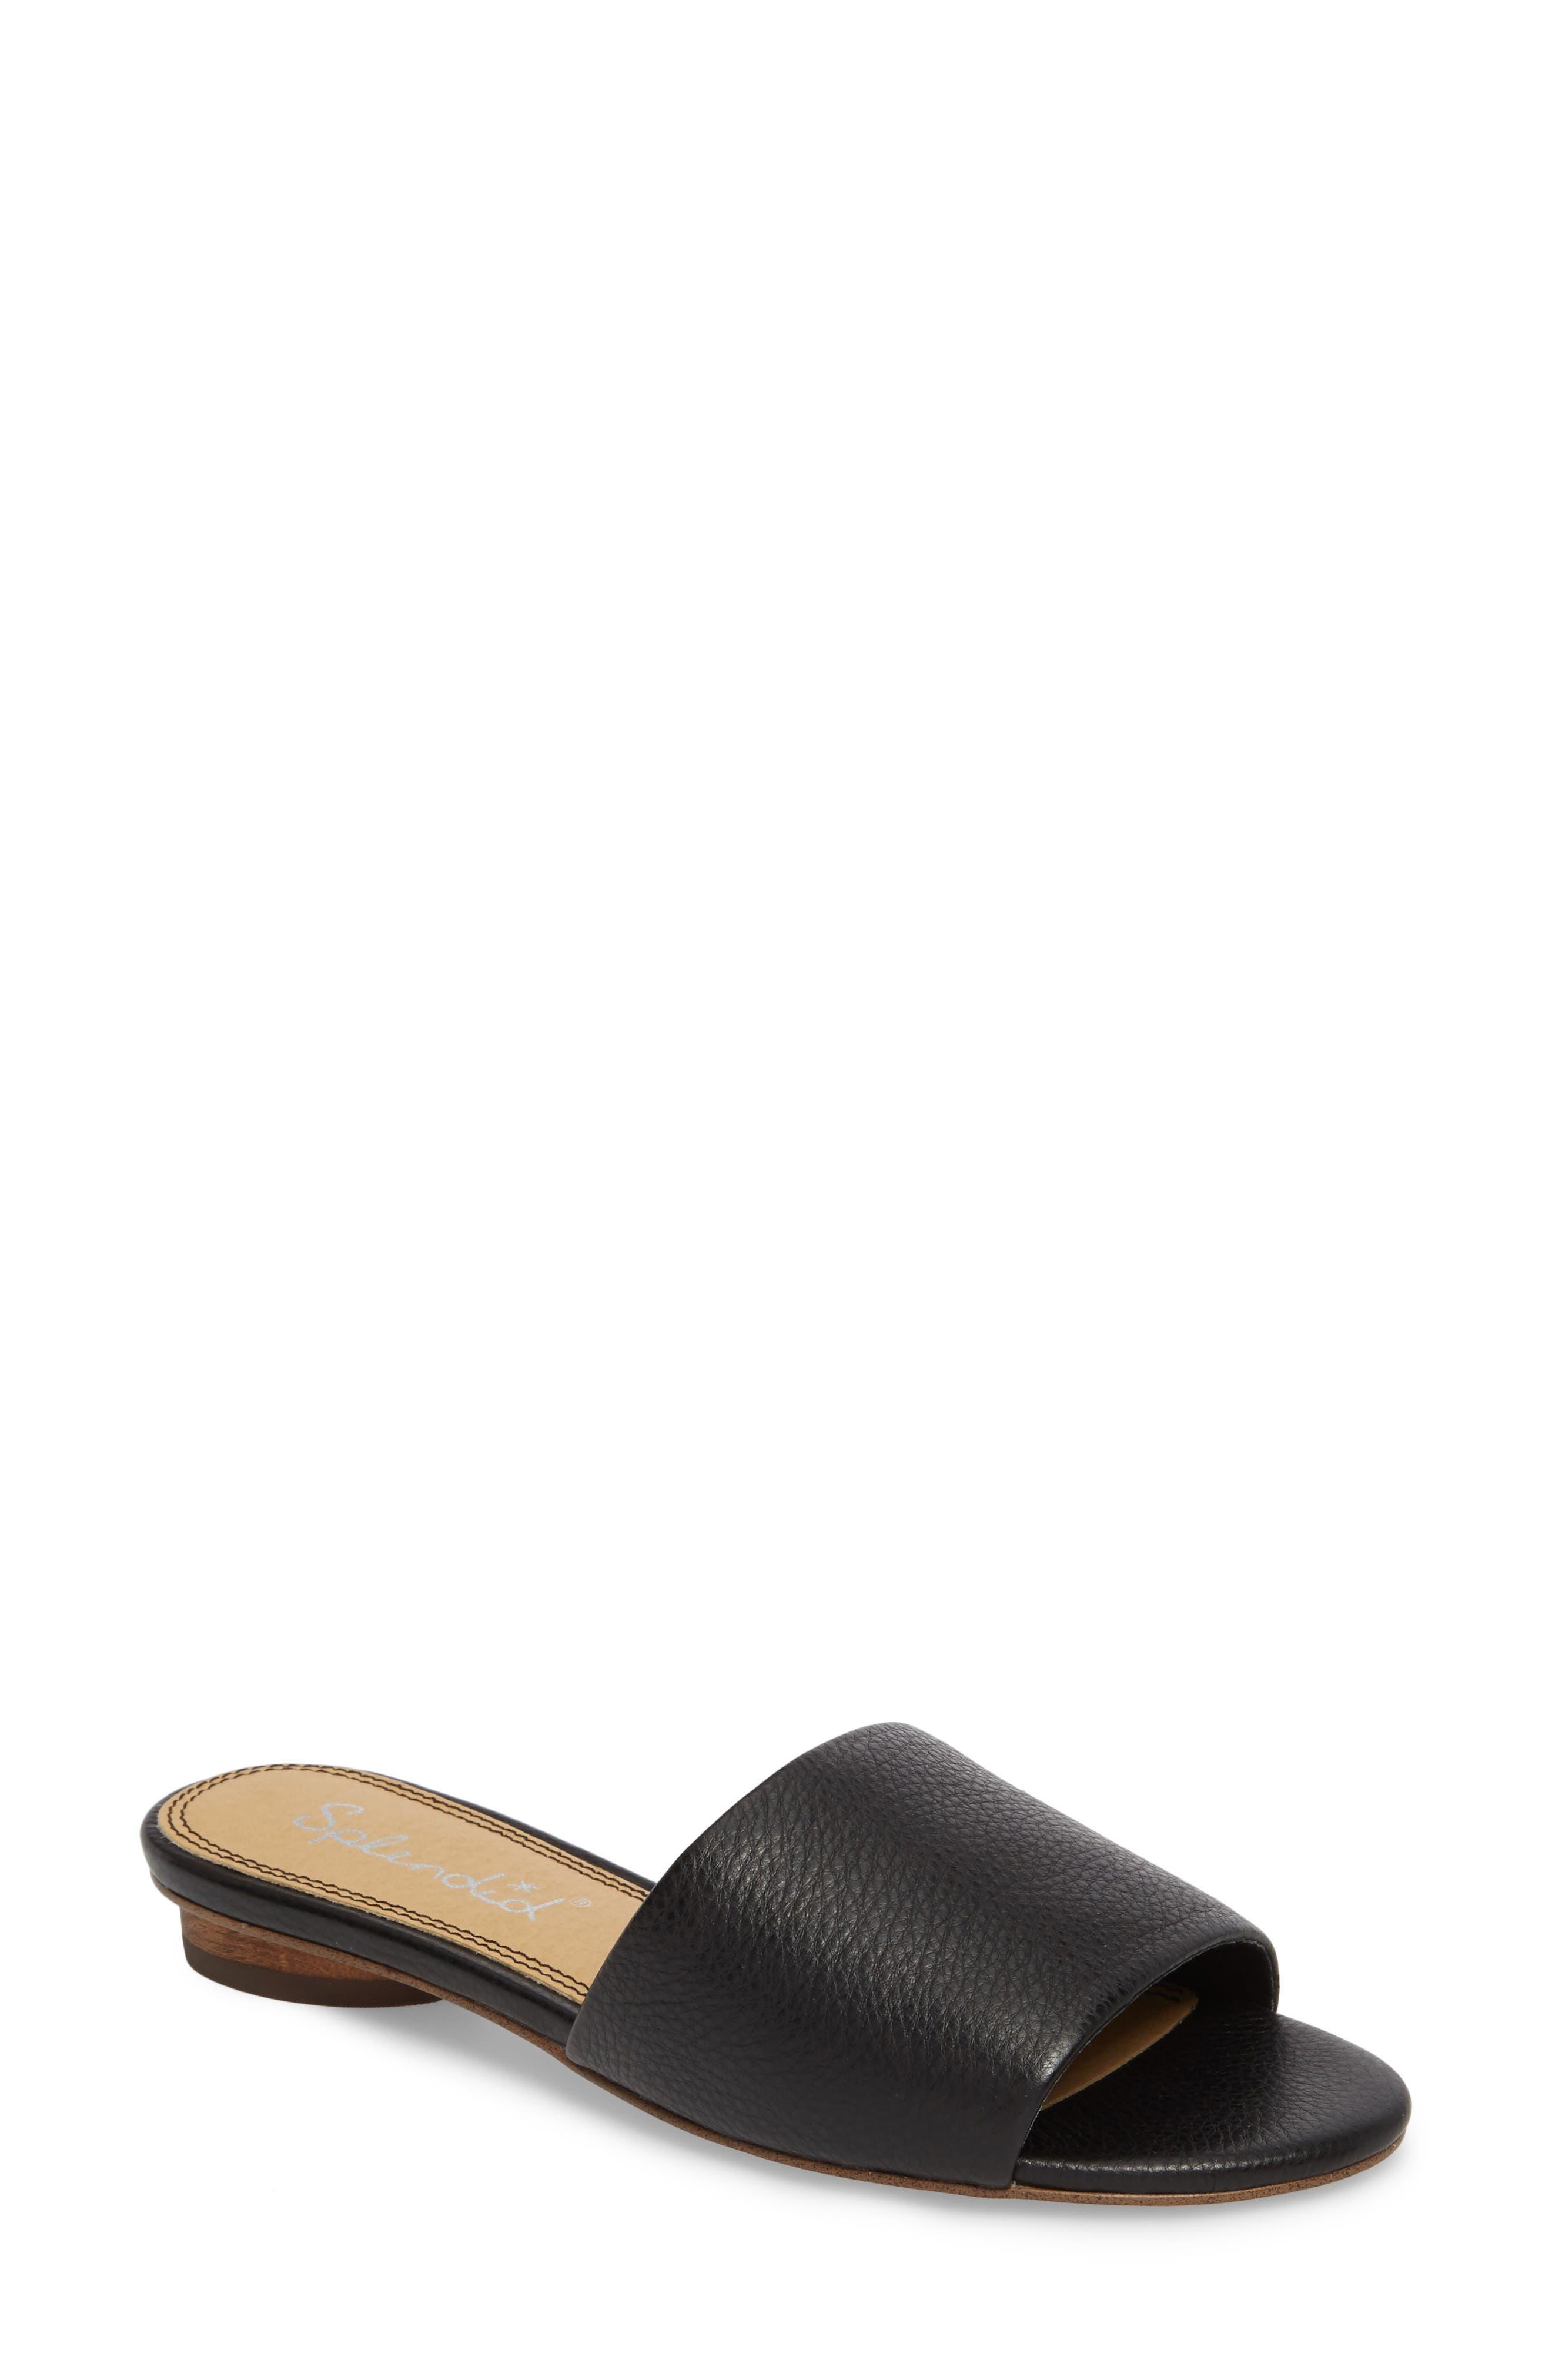 Betsy Slide Sandal,                         Main,                         color, 002